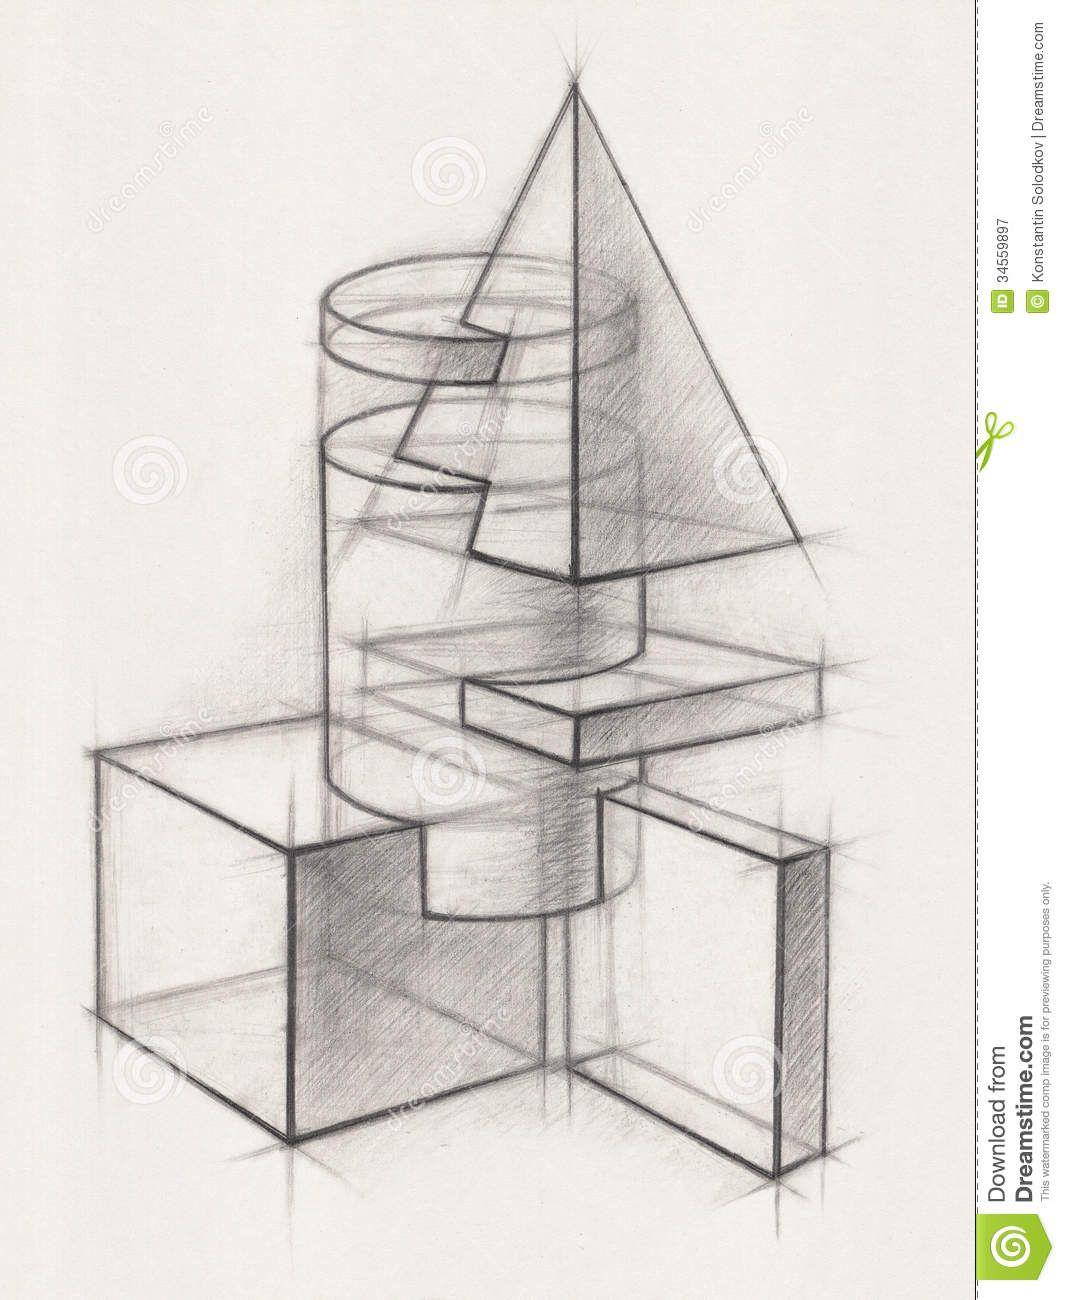 Pix for geometric shape drawing pinteres - Figure libre architecture ...